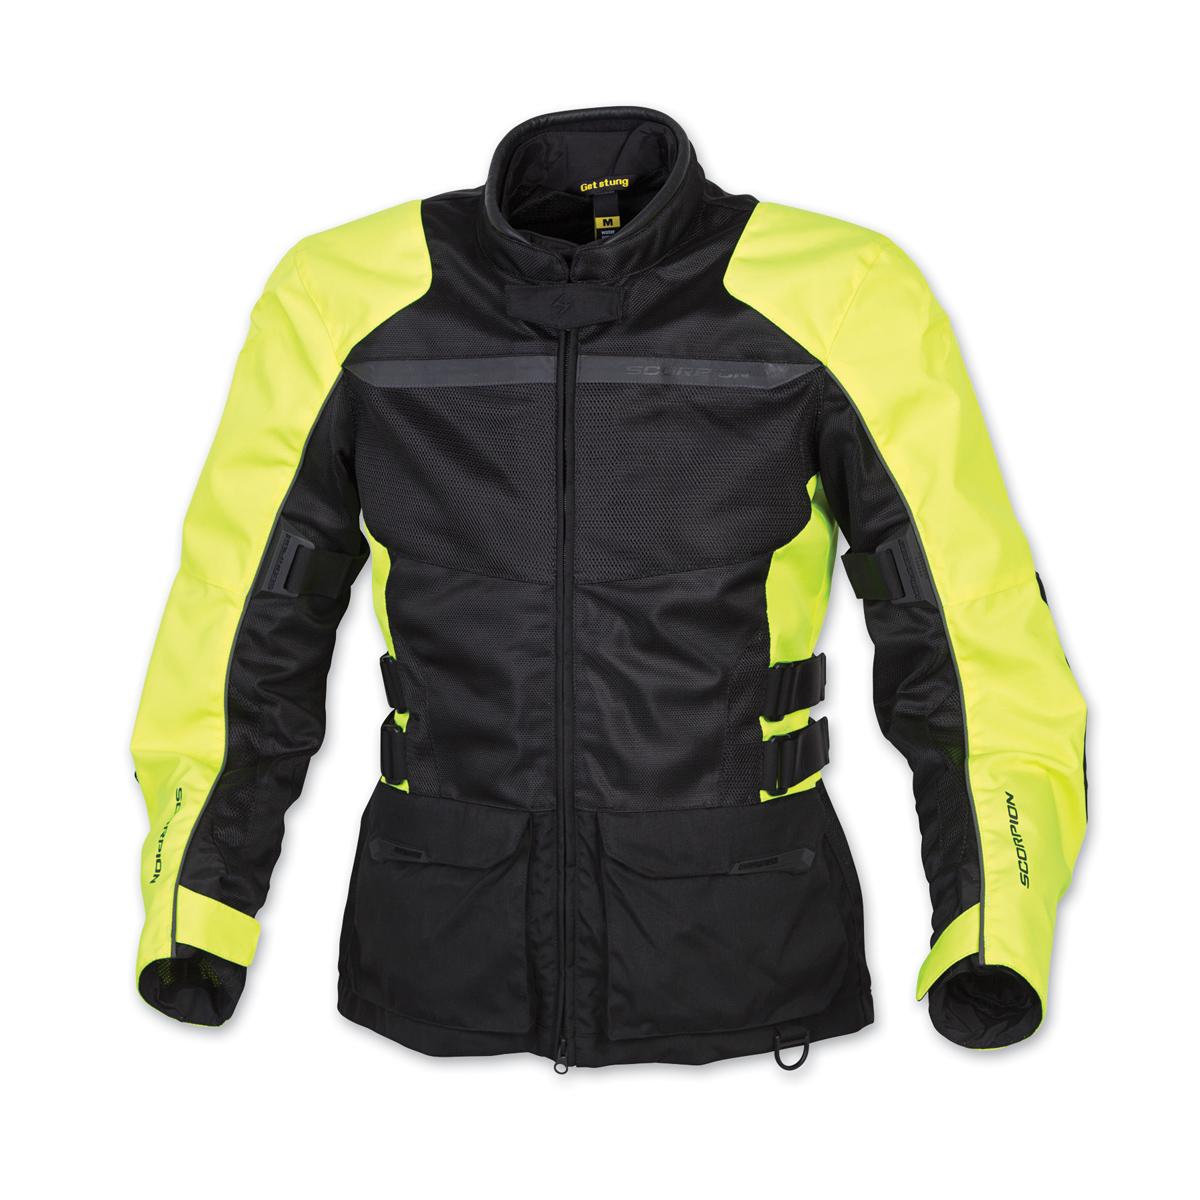 Scorpion EXO Men's Yuma Hi-Viz Jacket